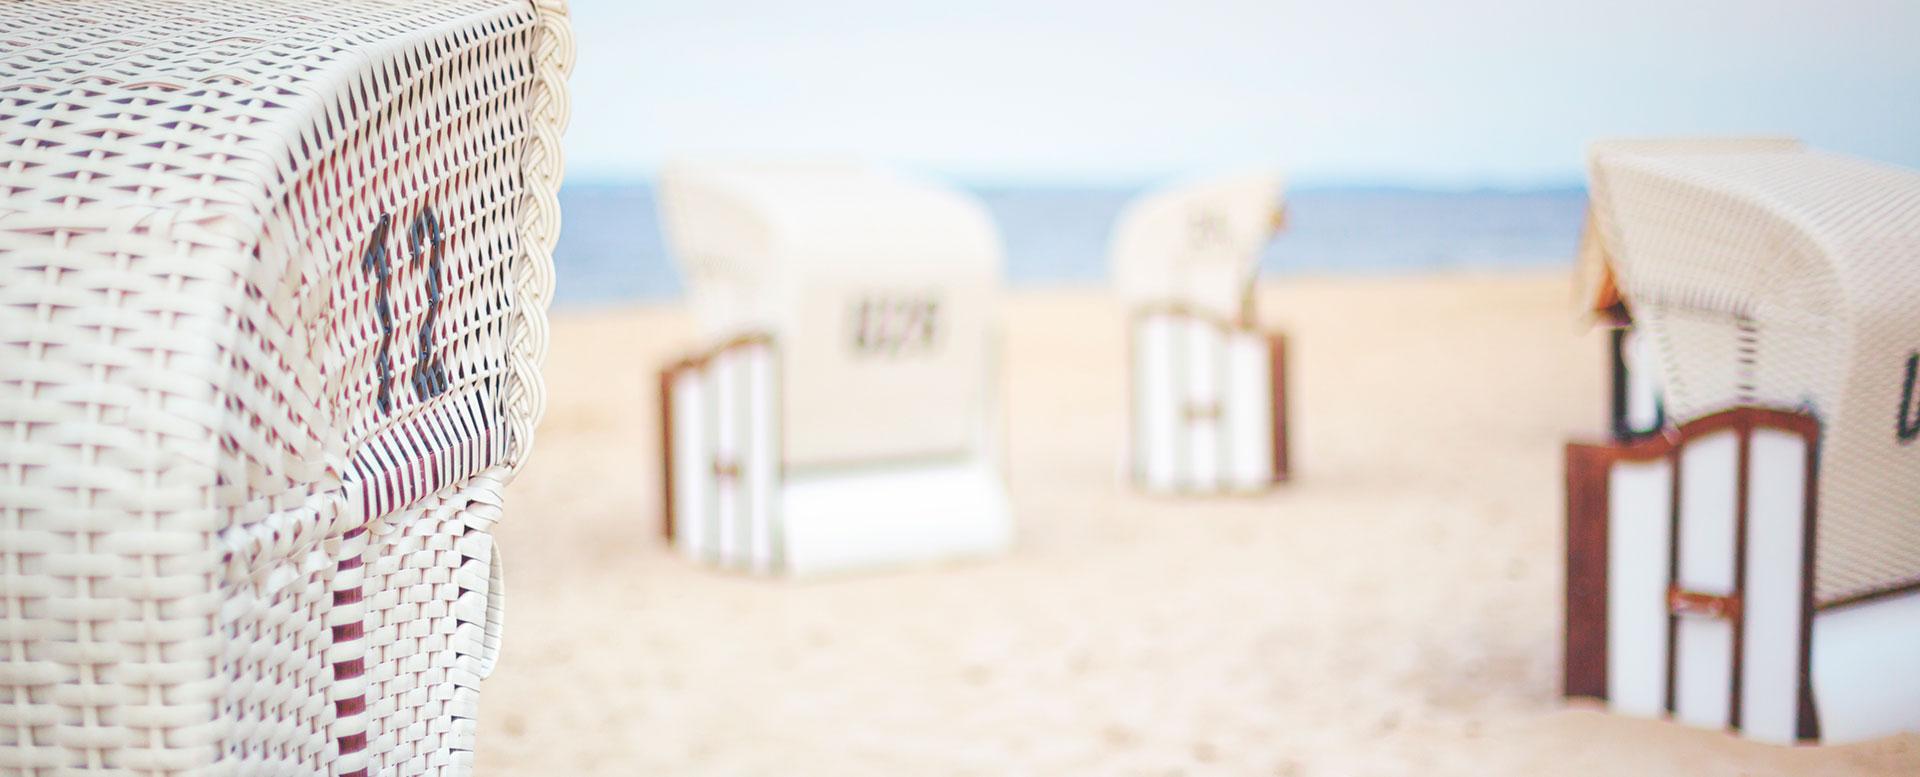 Usedom - Strand und Strandkörbe